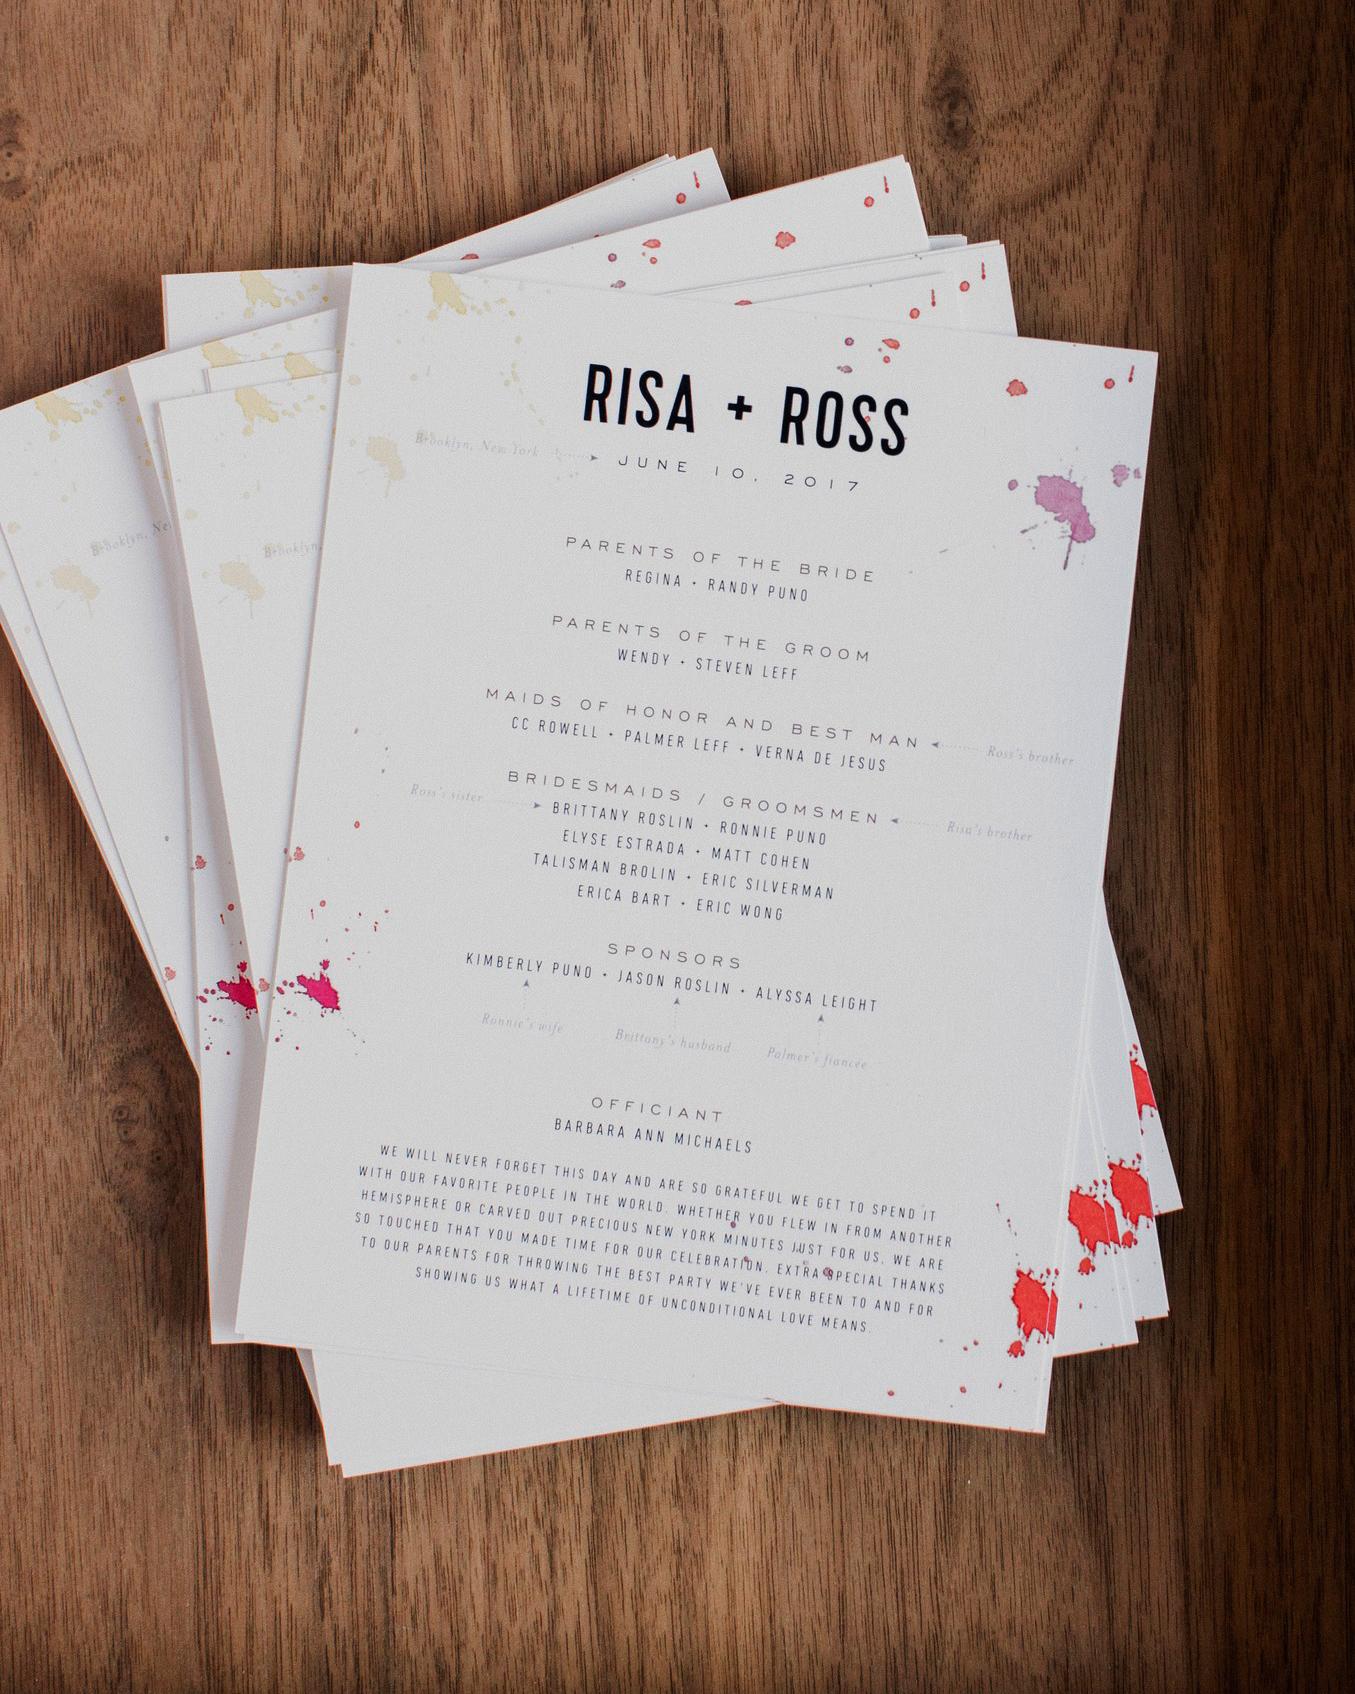 risa ross wedding brooklyn new york program